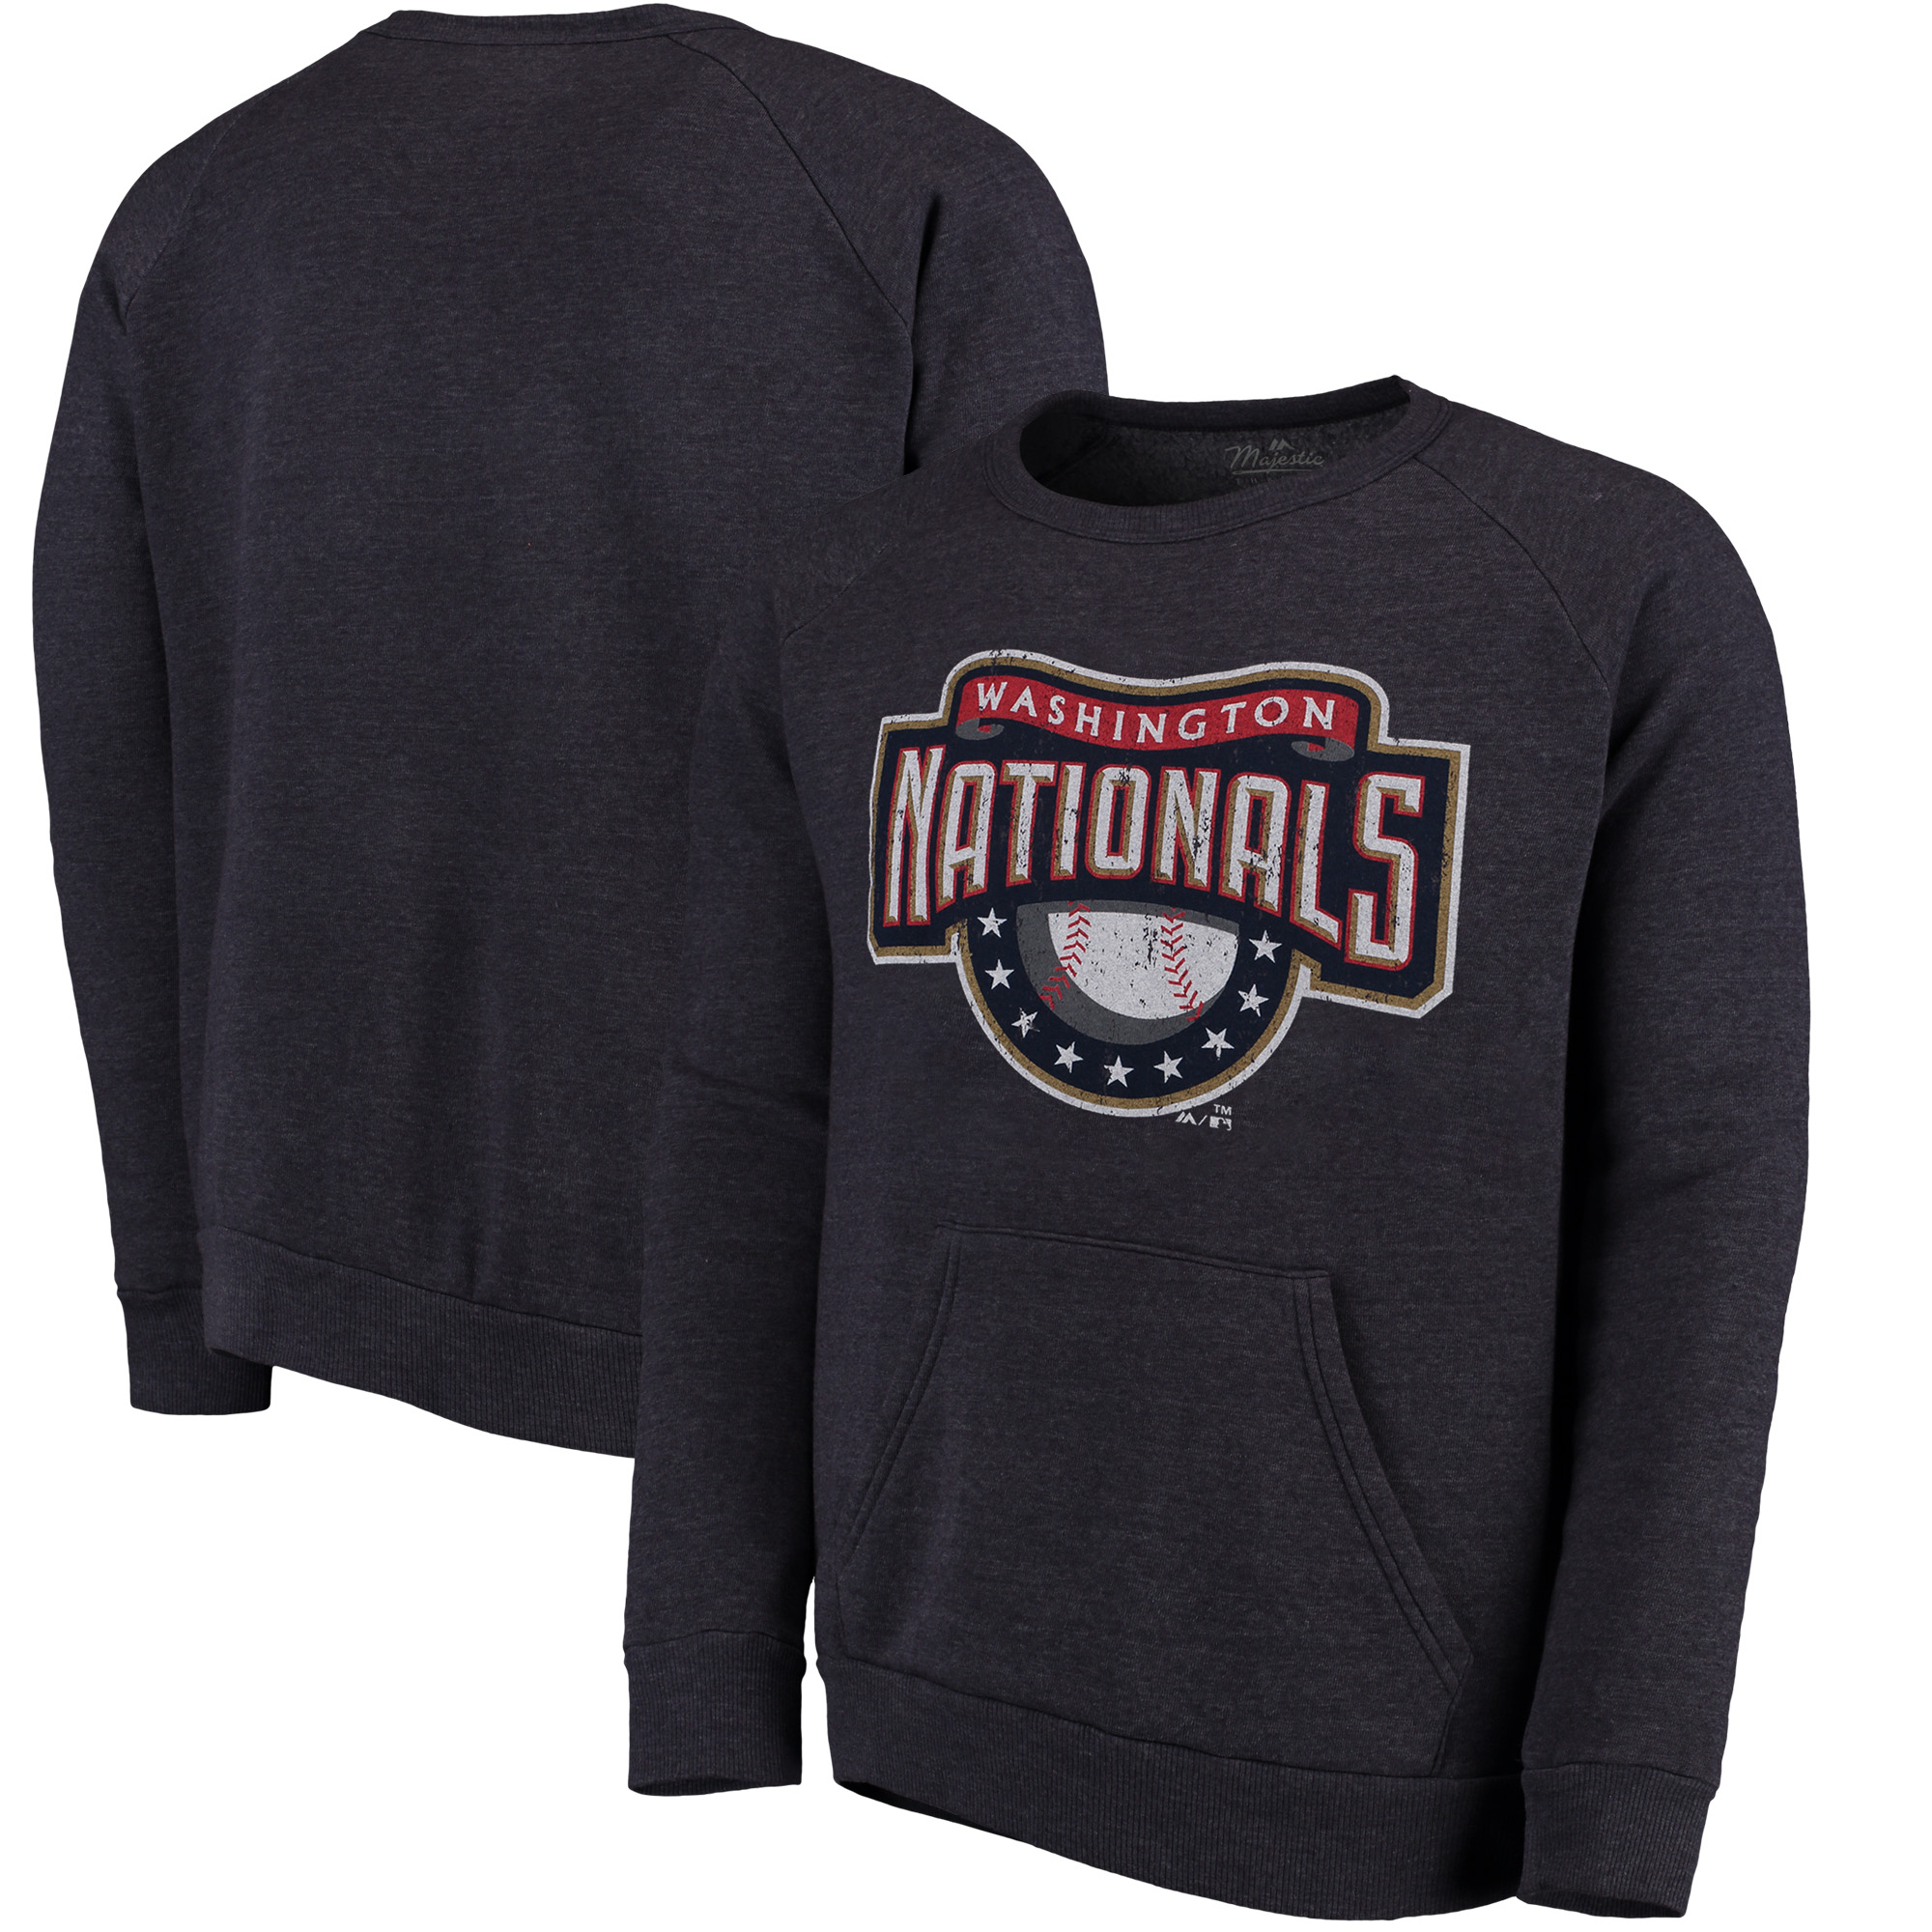 Washington Nationals Majestic Threads Cooperstown Collection Tri-Blend Pocket Fleece Sweatshirt - Navy